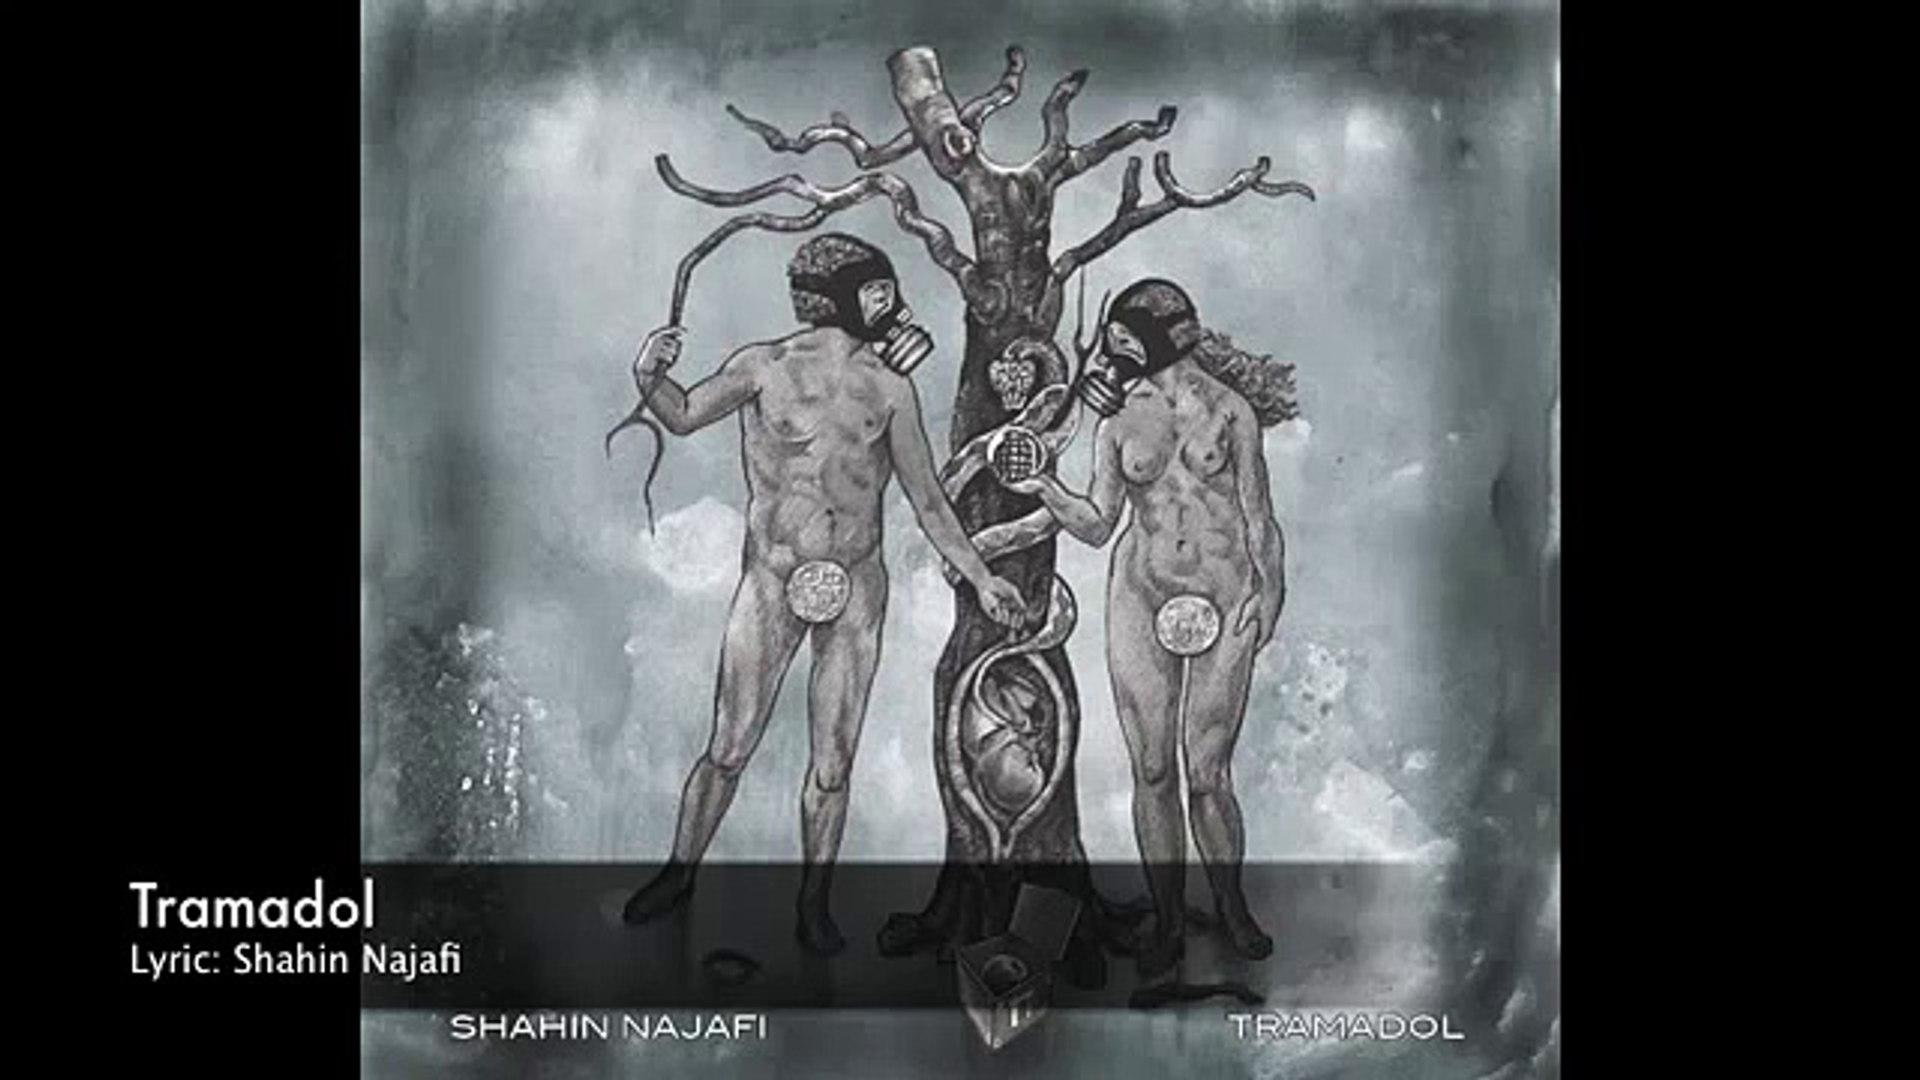 tramadol Album Tramadol shahin Najafi